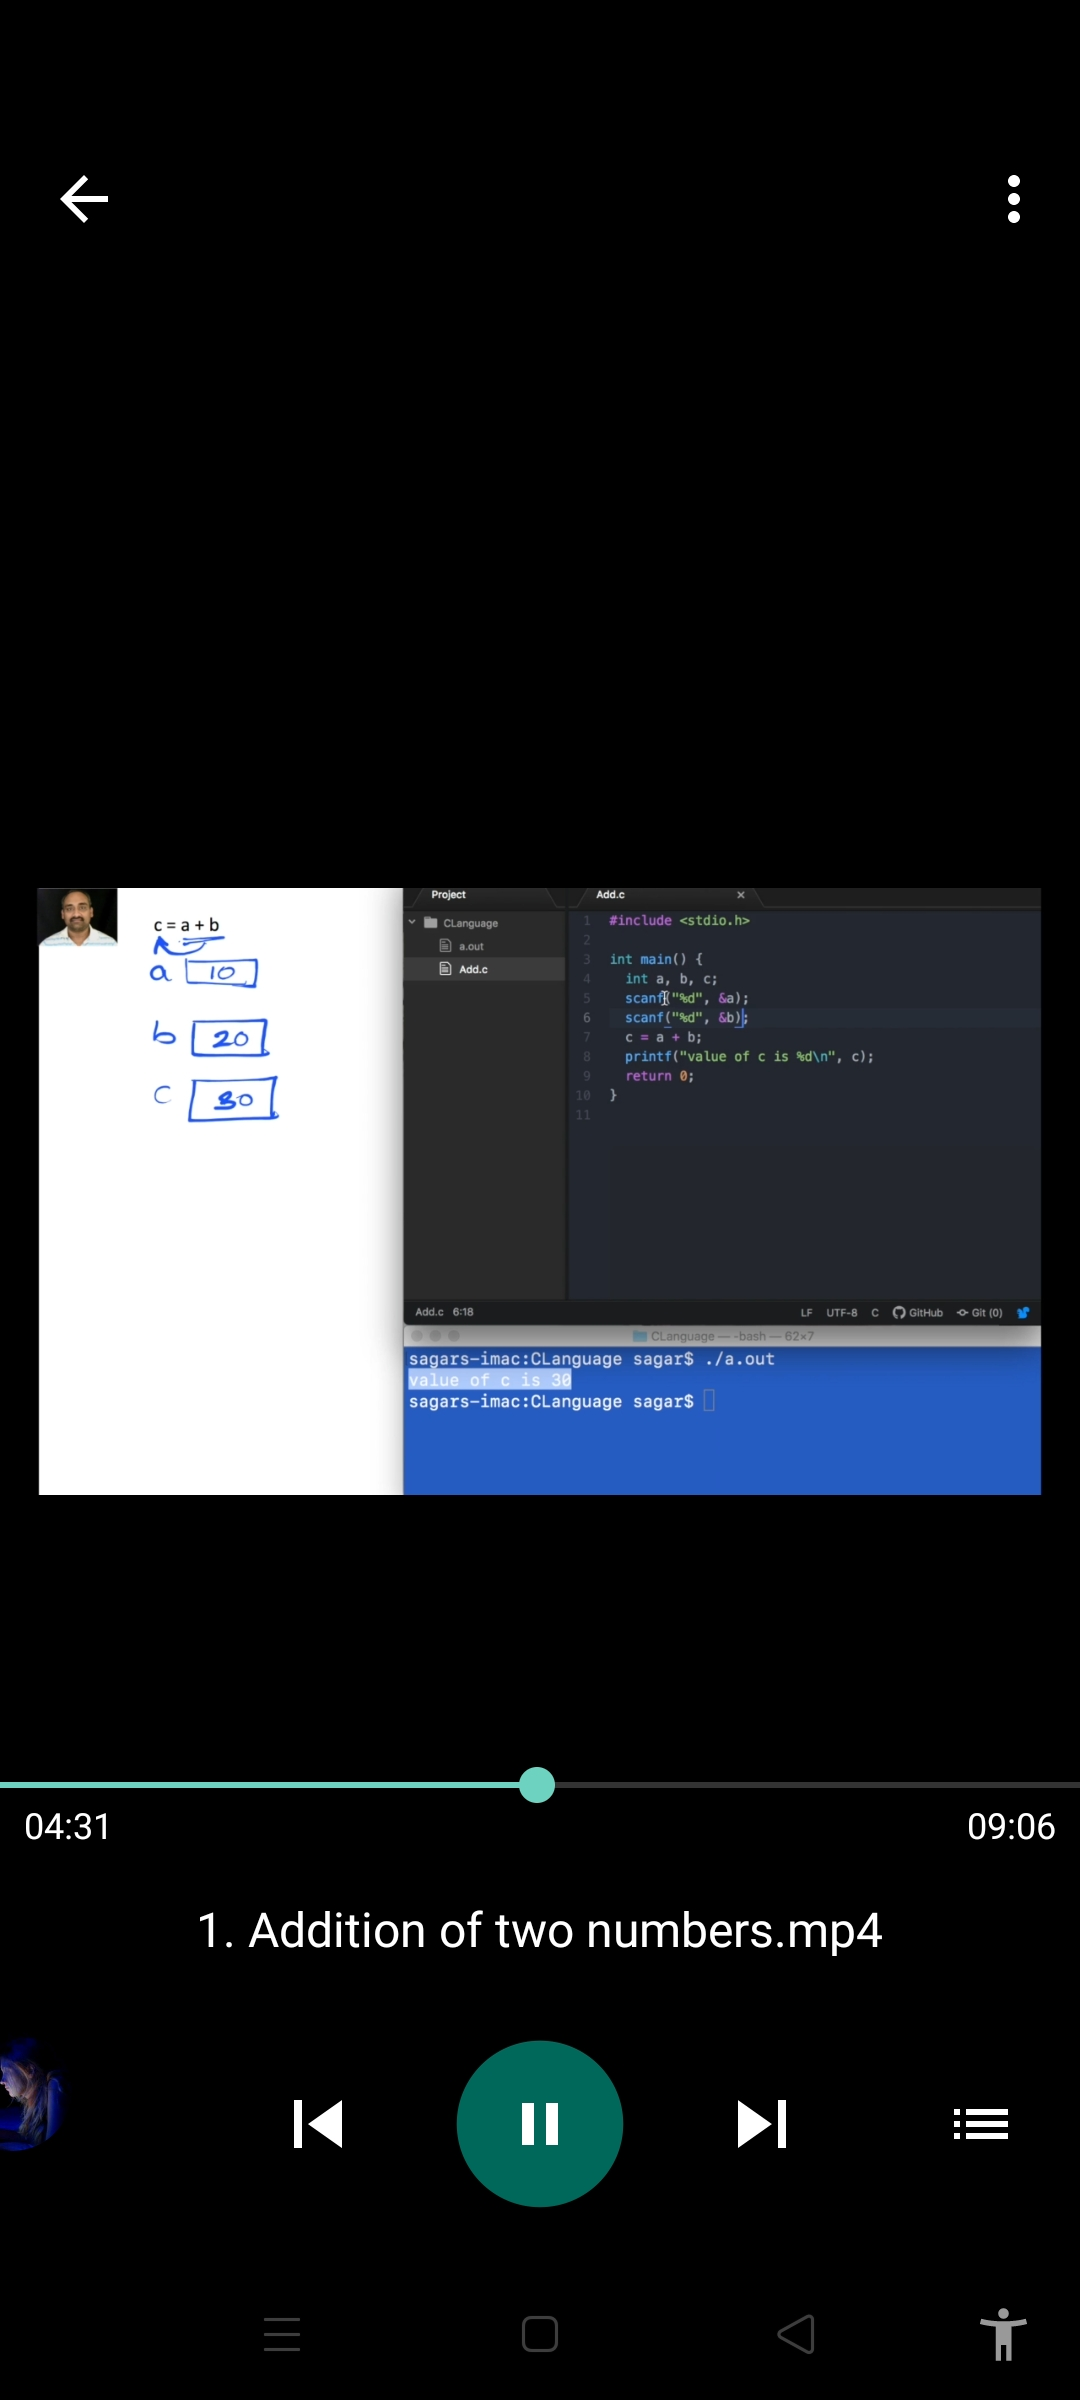 Master The C Programming - প্রাথমিক থেকে অ্যাডভান্স লেভেল ।